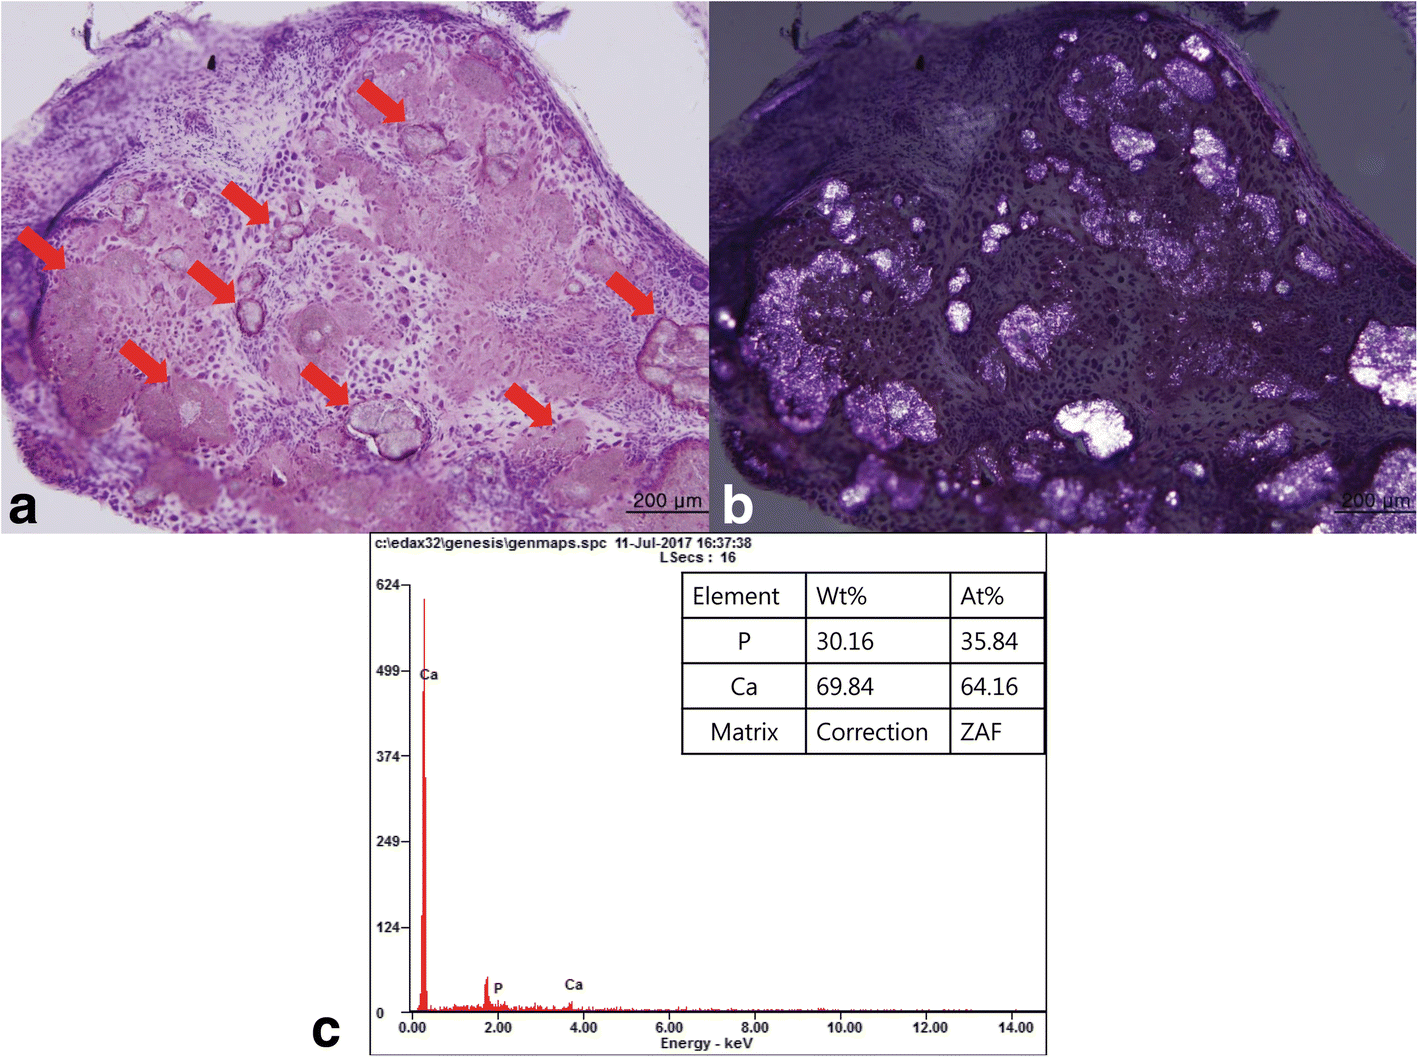 Calcium pyrophosphate dihydrate deposition disease in the